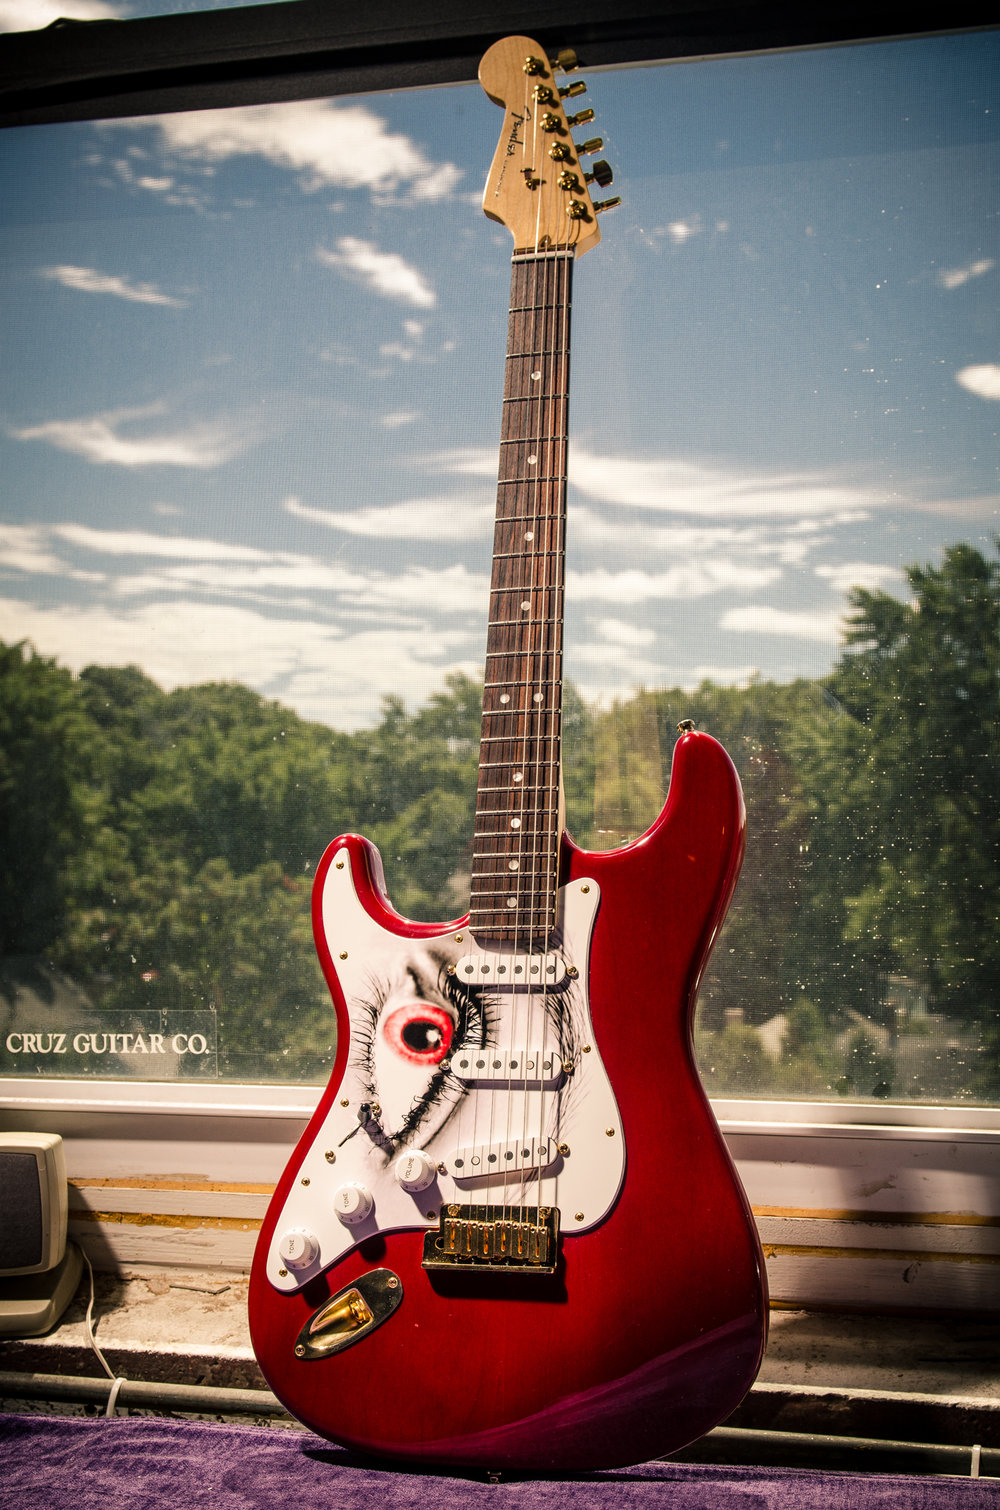 Left Handed Fender Stratocaster Body Best 2018 Guitar Wiring Diagram Lefty Mexican Sss Pickguard